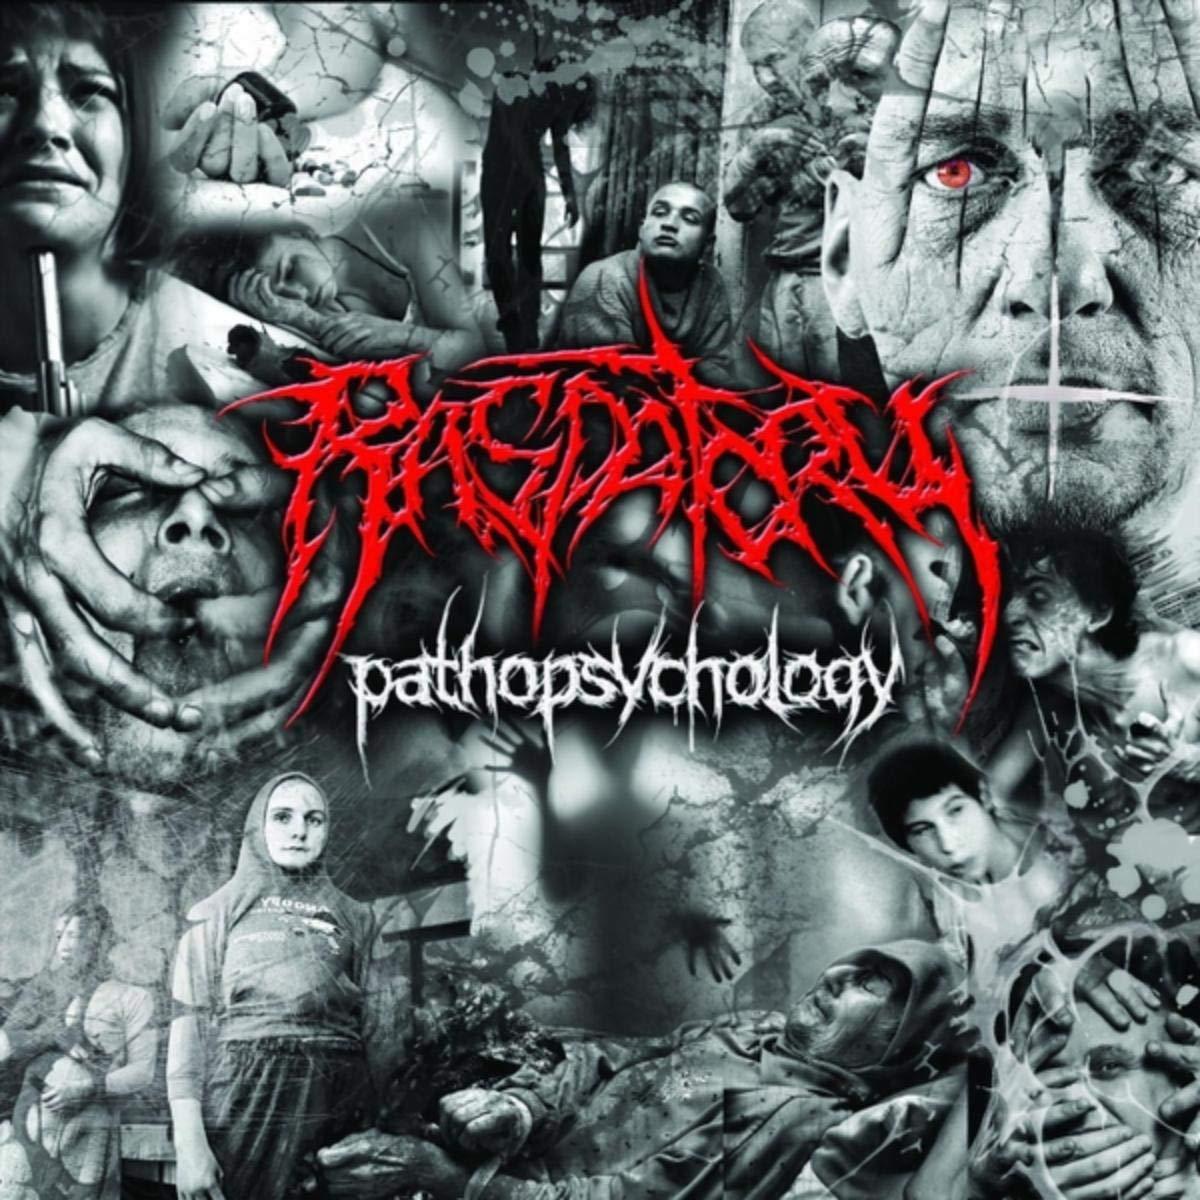 Raspatory – Pathopsychology (2021) [FLAC]